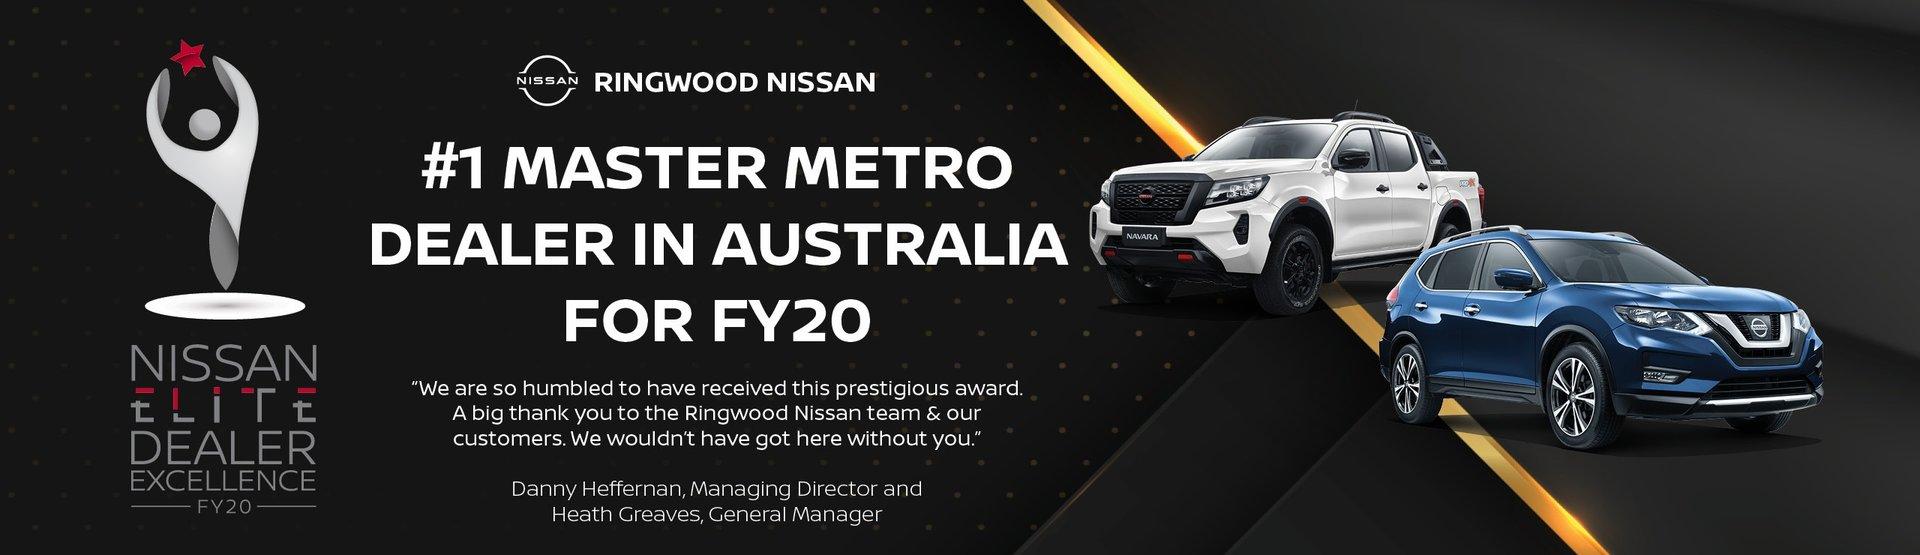 Ringwood-Nissan-Dealer-Excellence-HPB-AUG21-PK.jpgRingwood-Nissan-Dealer-Excellence